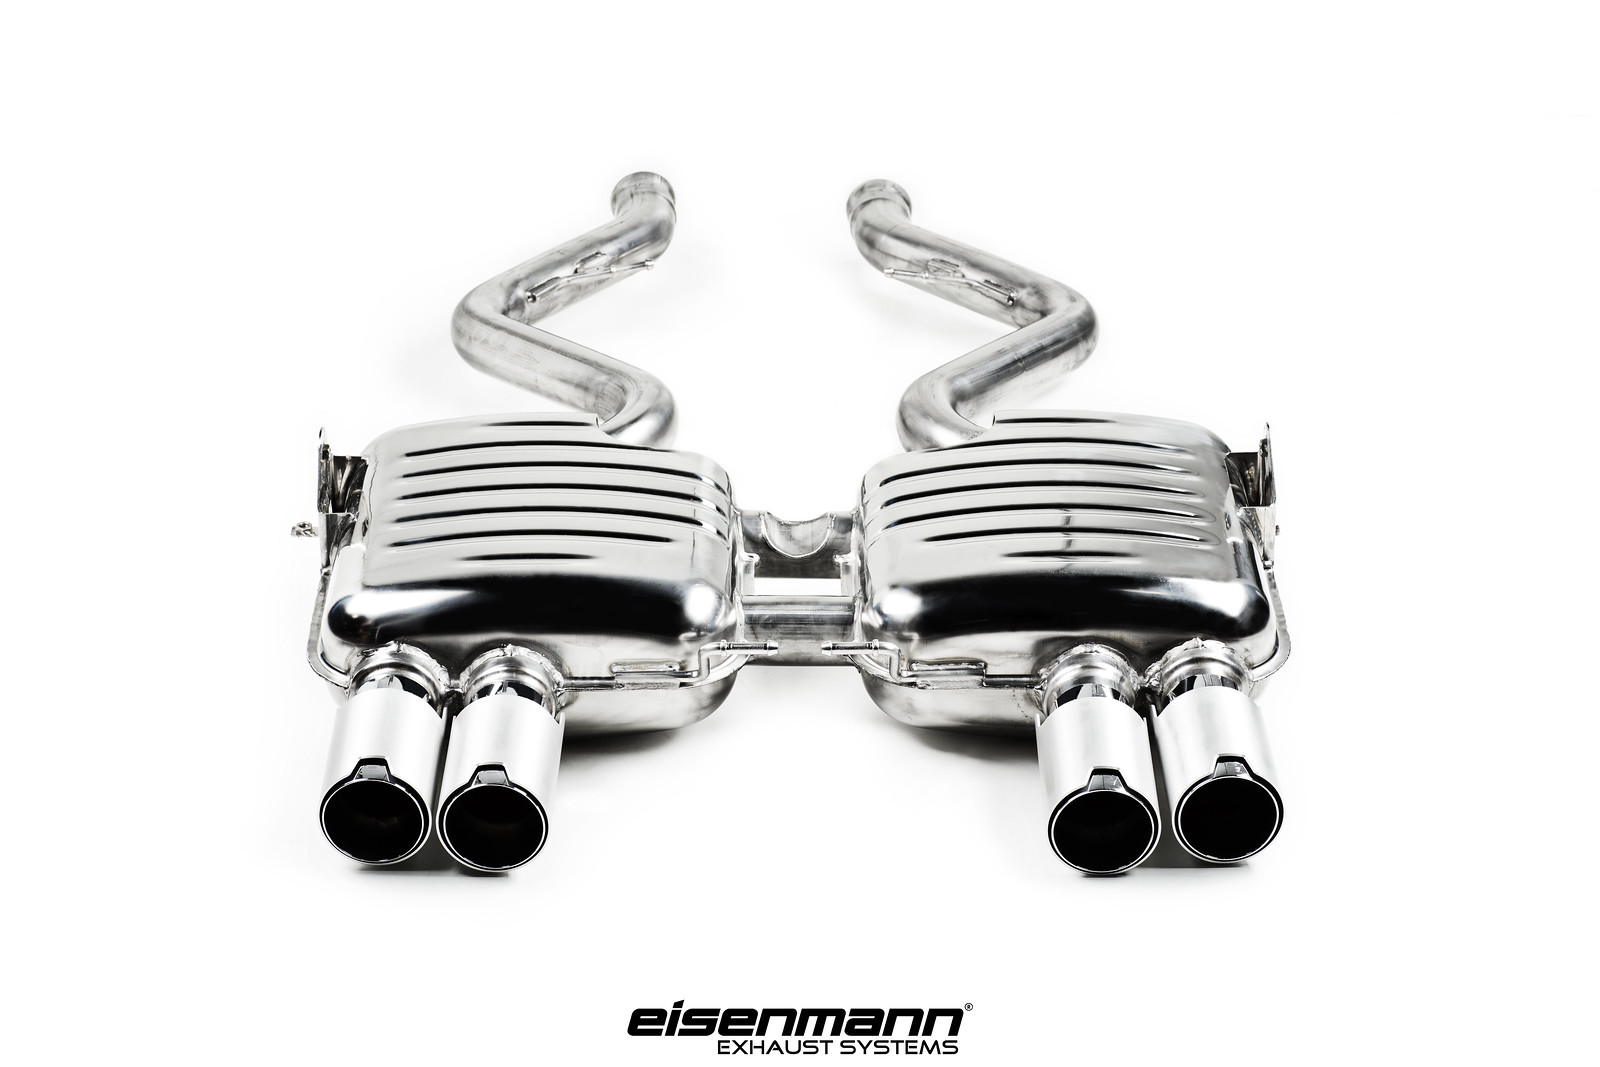 Eisenmann E9x M3 Signature Tips 4x90mm Limited Release